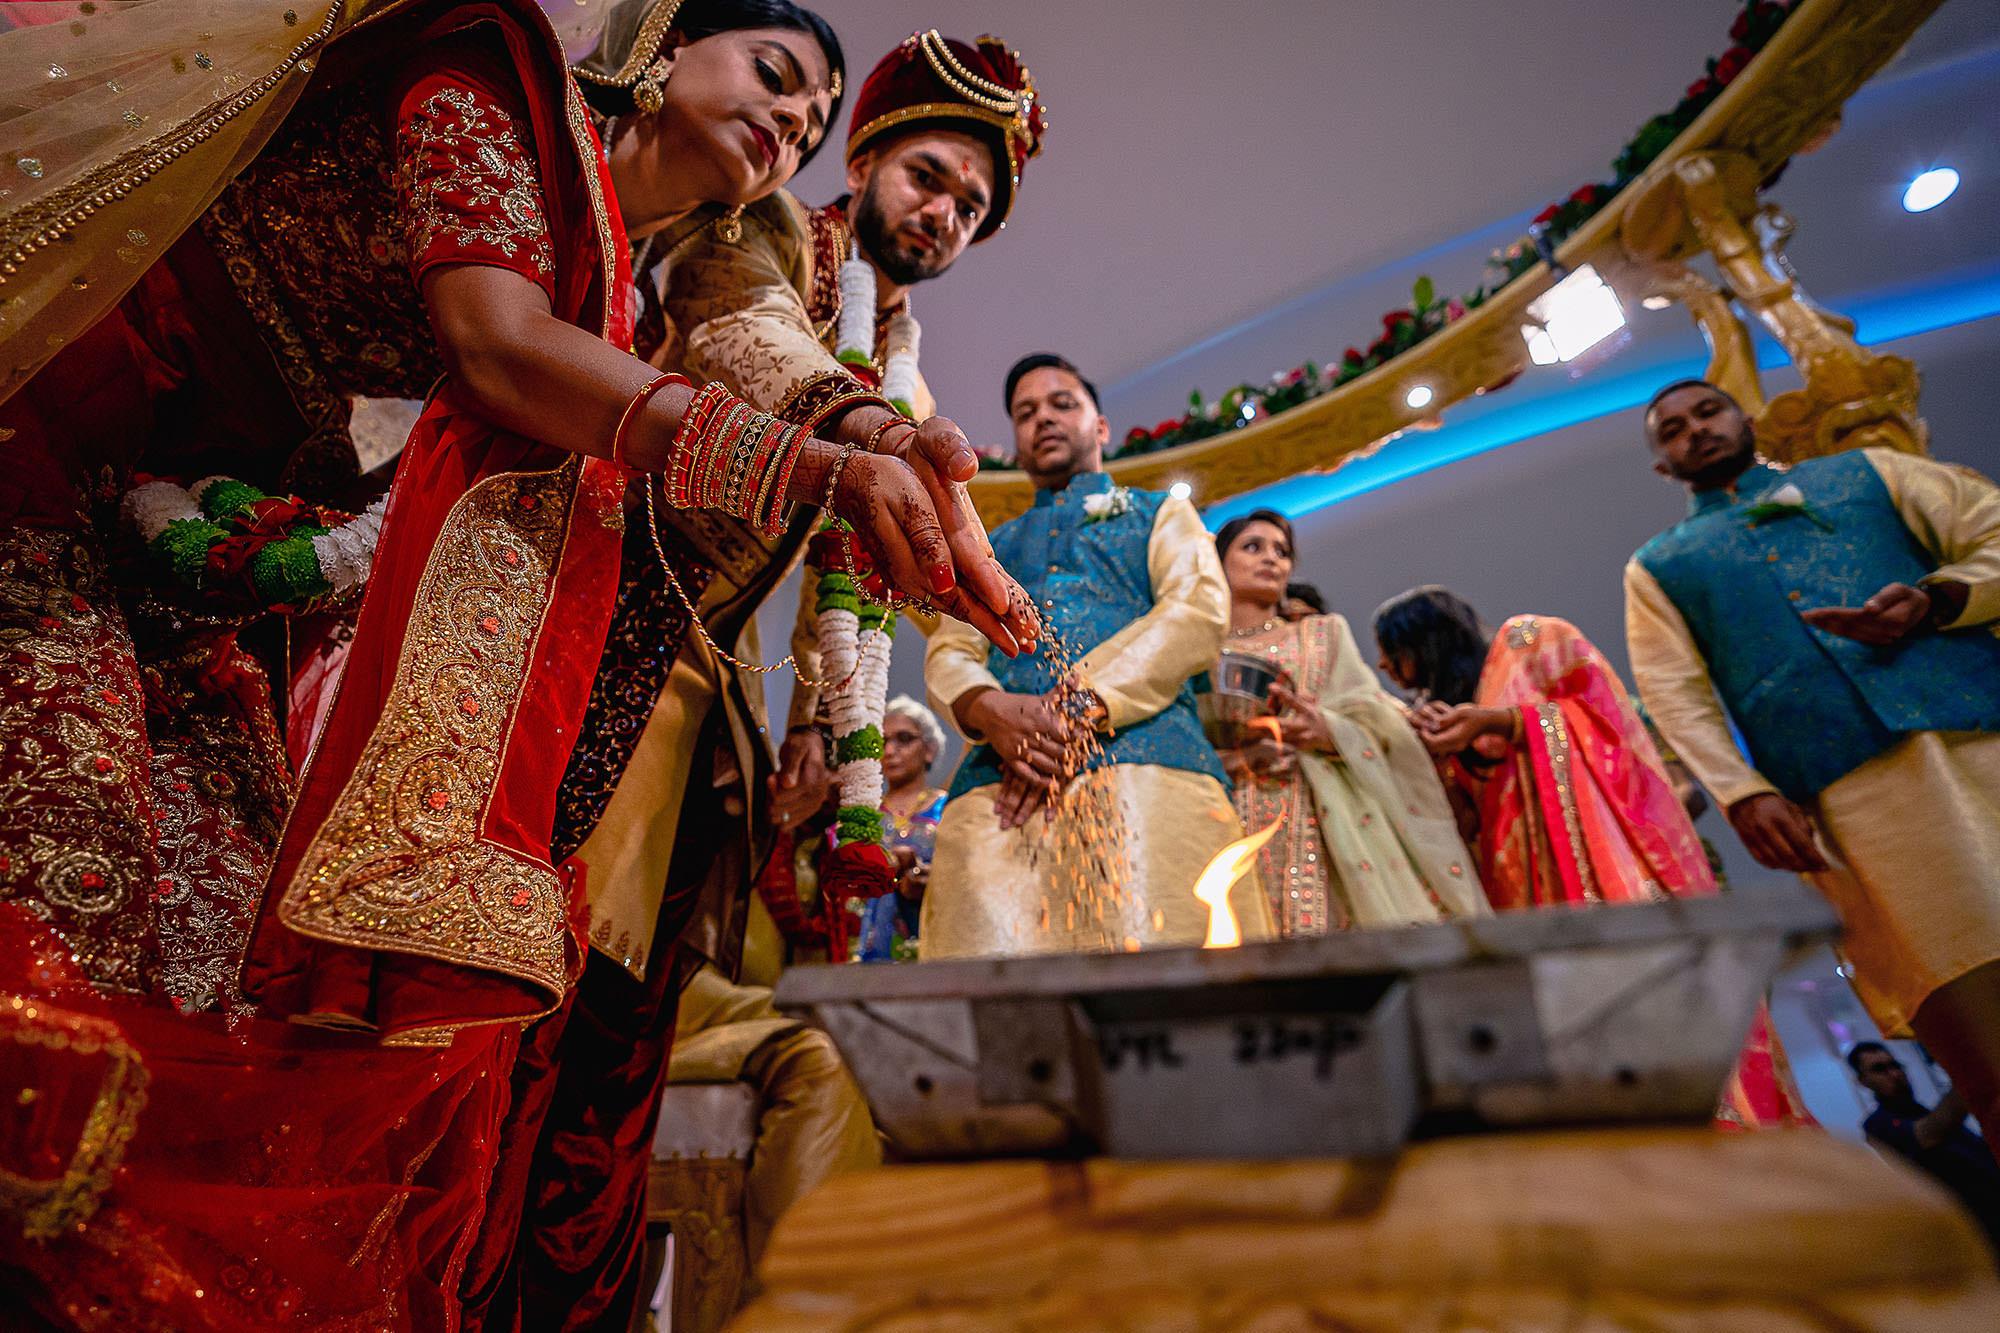 hindu wedding fire ceremony leicester devan jigna